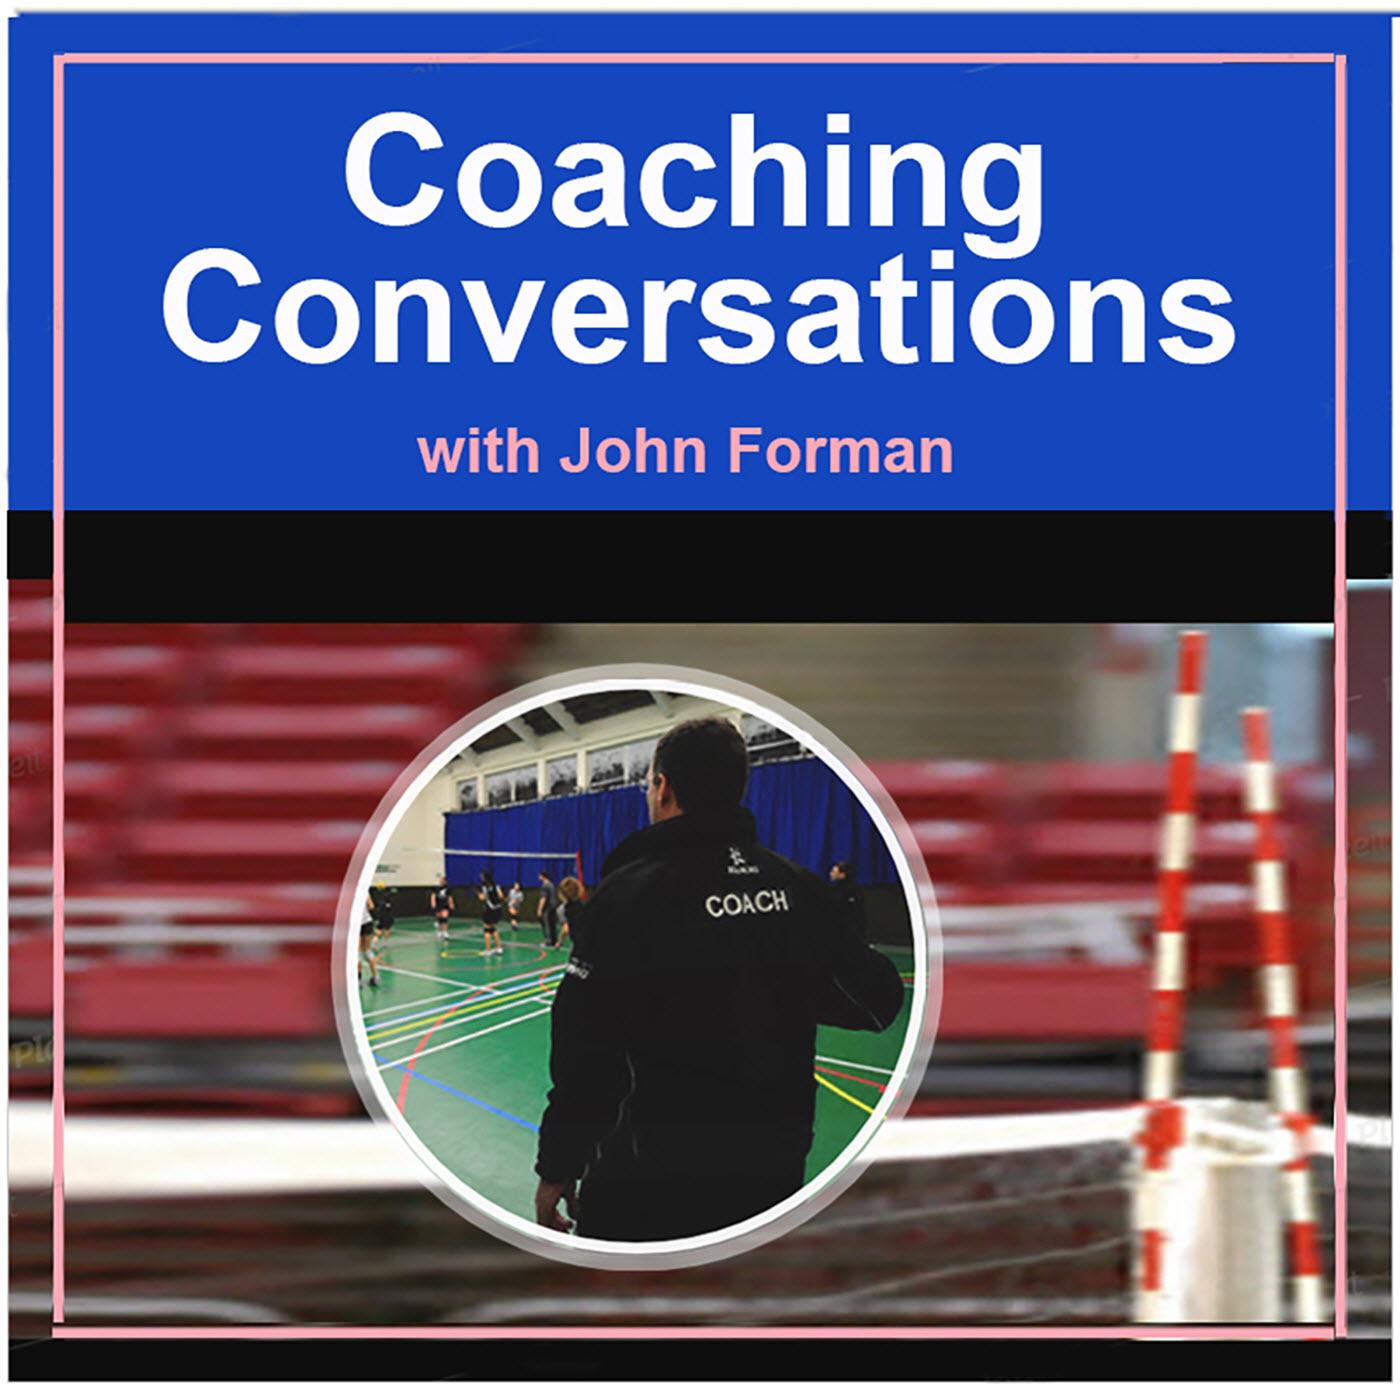 Coaching Conversations – Coaching Volleyball